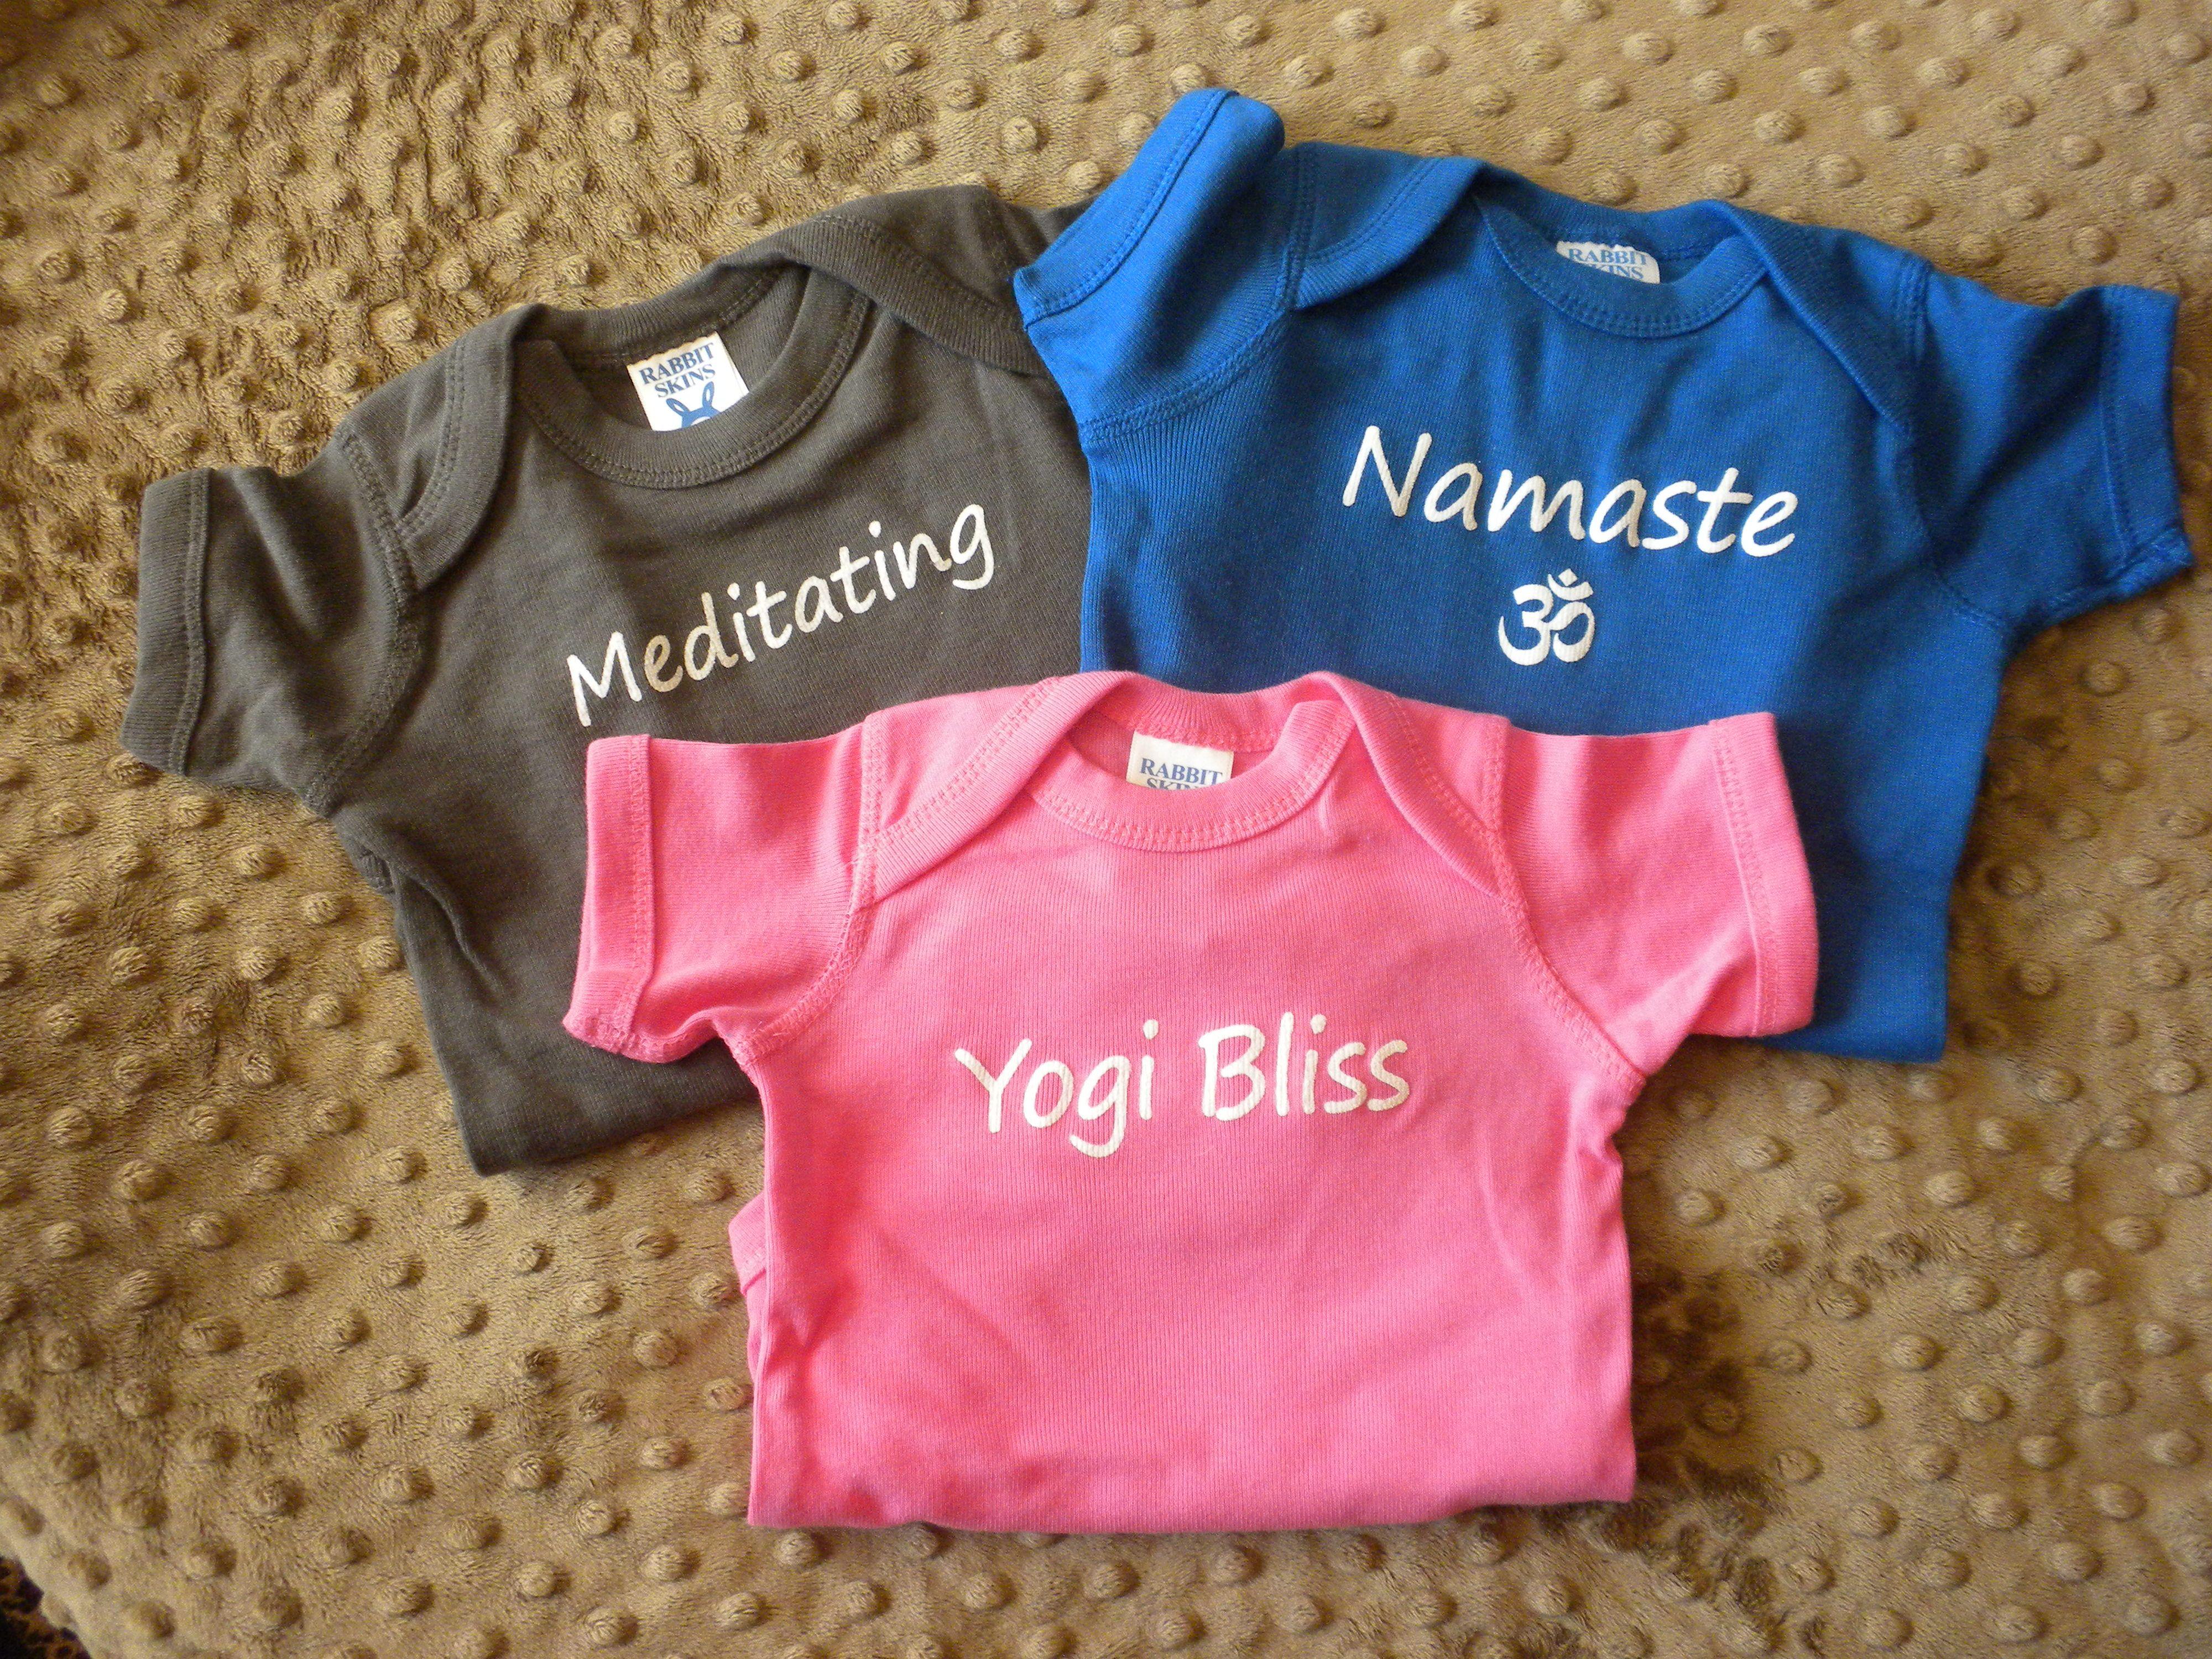 Adorable Yoga Onsies....http://www.ebay.com/itm/Meditating-Yoga-Baby-Onsie-NB-or-6-months/171402205191?_trksid=p2047675.c100005.m1851&_trkparms=aid%3D222007%26algo%3DSIC.MBE%26ao%3D1%26asc%3D20131003132420%26meid%3D8682894192607861941%26pid%3D100005%26prg%3D20131003132420%26rk%3D1%26rkt%3D6%26sd%3D171402206754&rt=nc